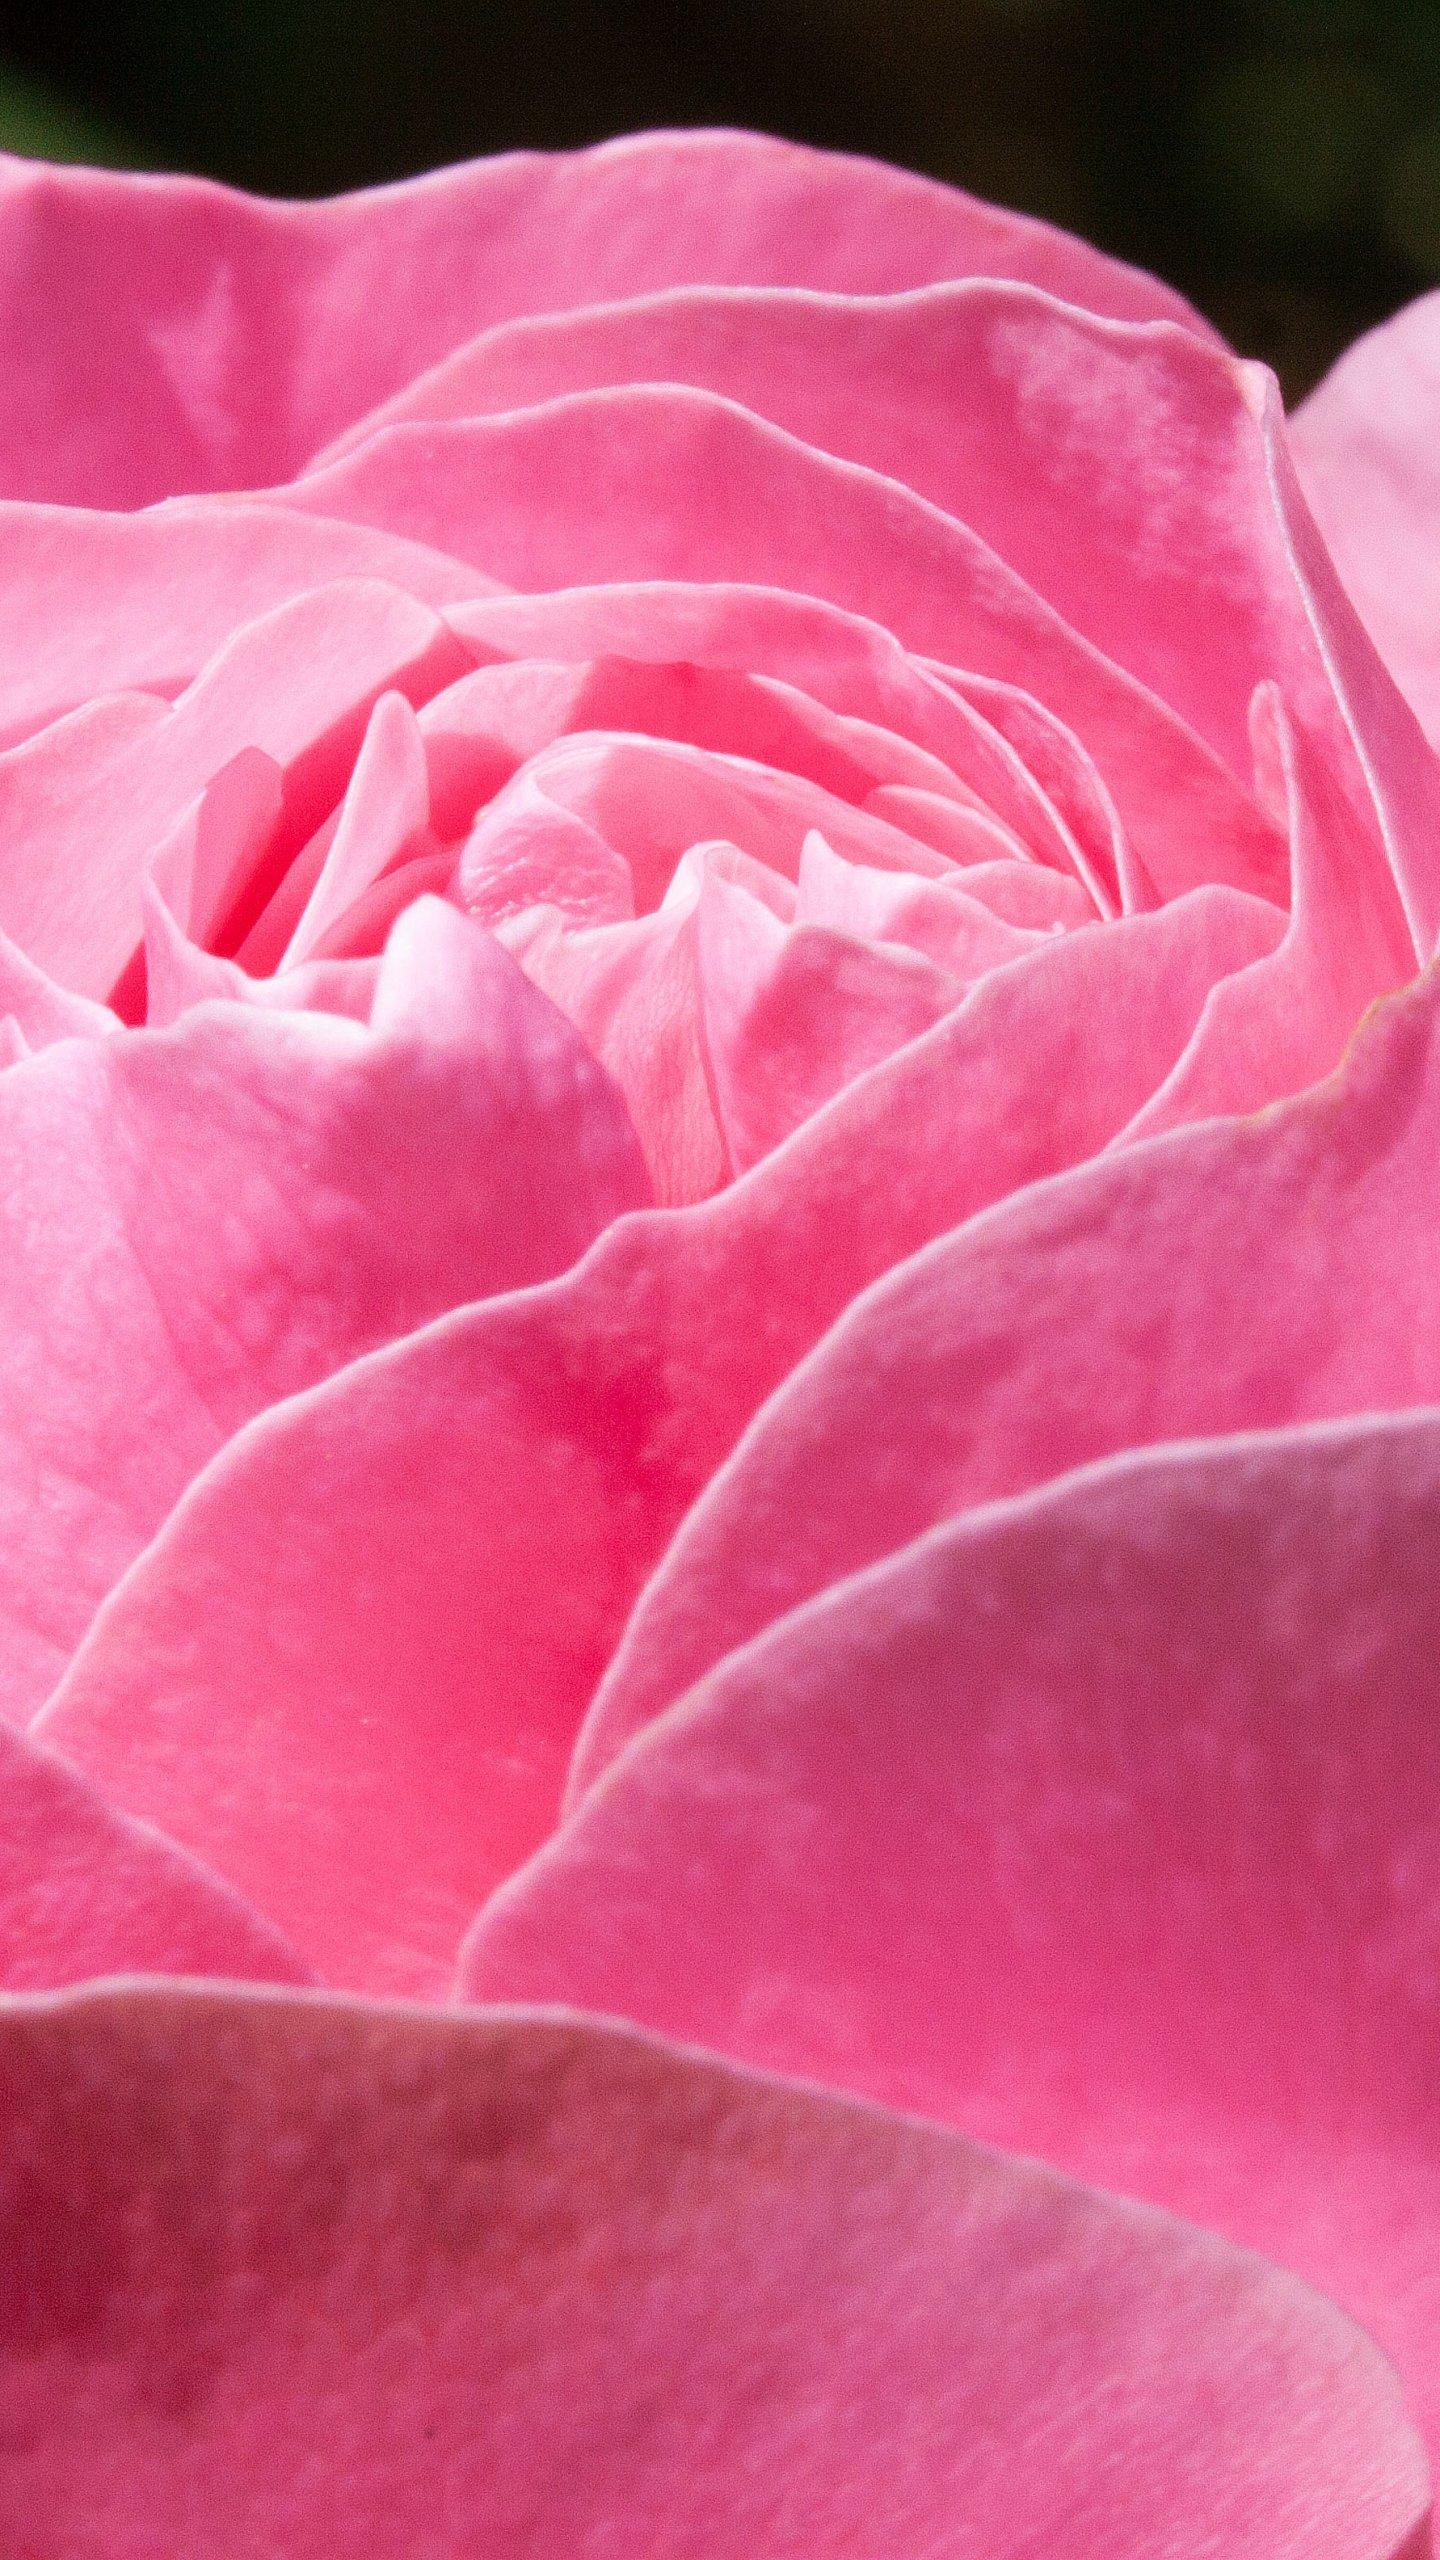 Pink Rose Wallpaper Iphone Android Desktop Backgrounds